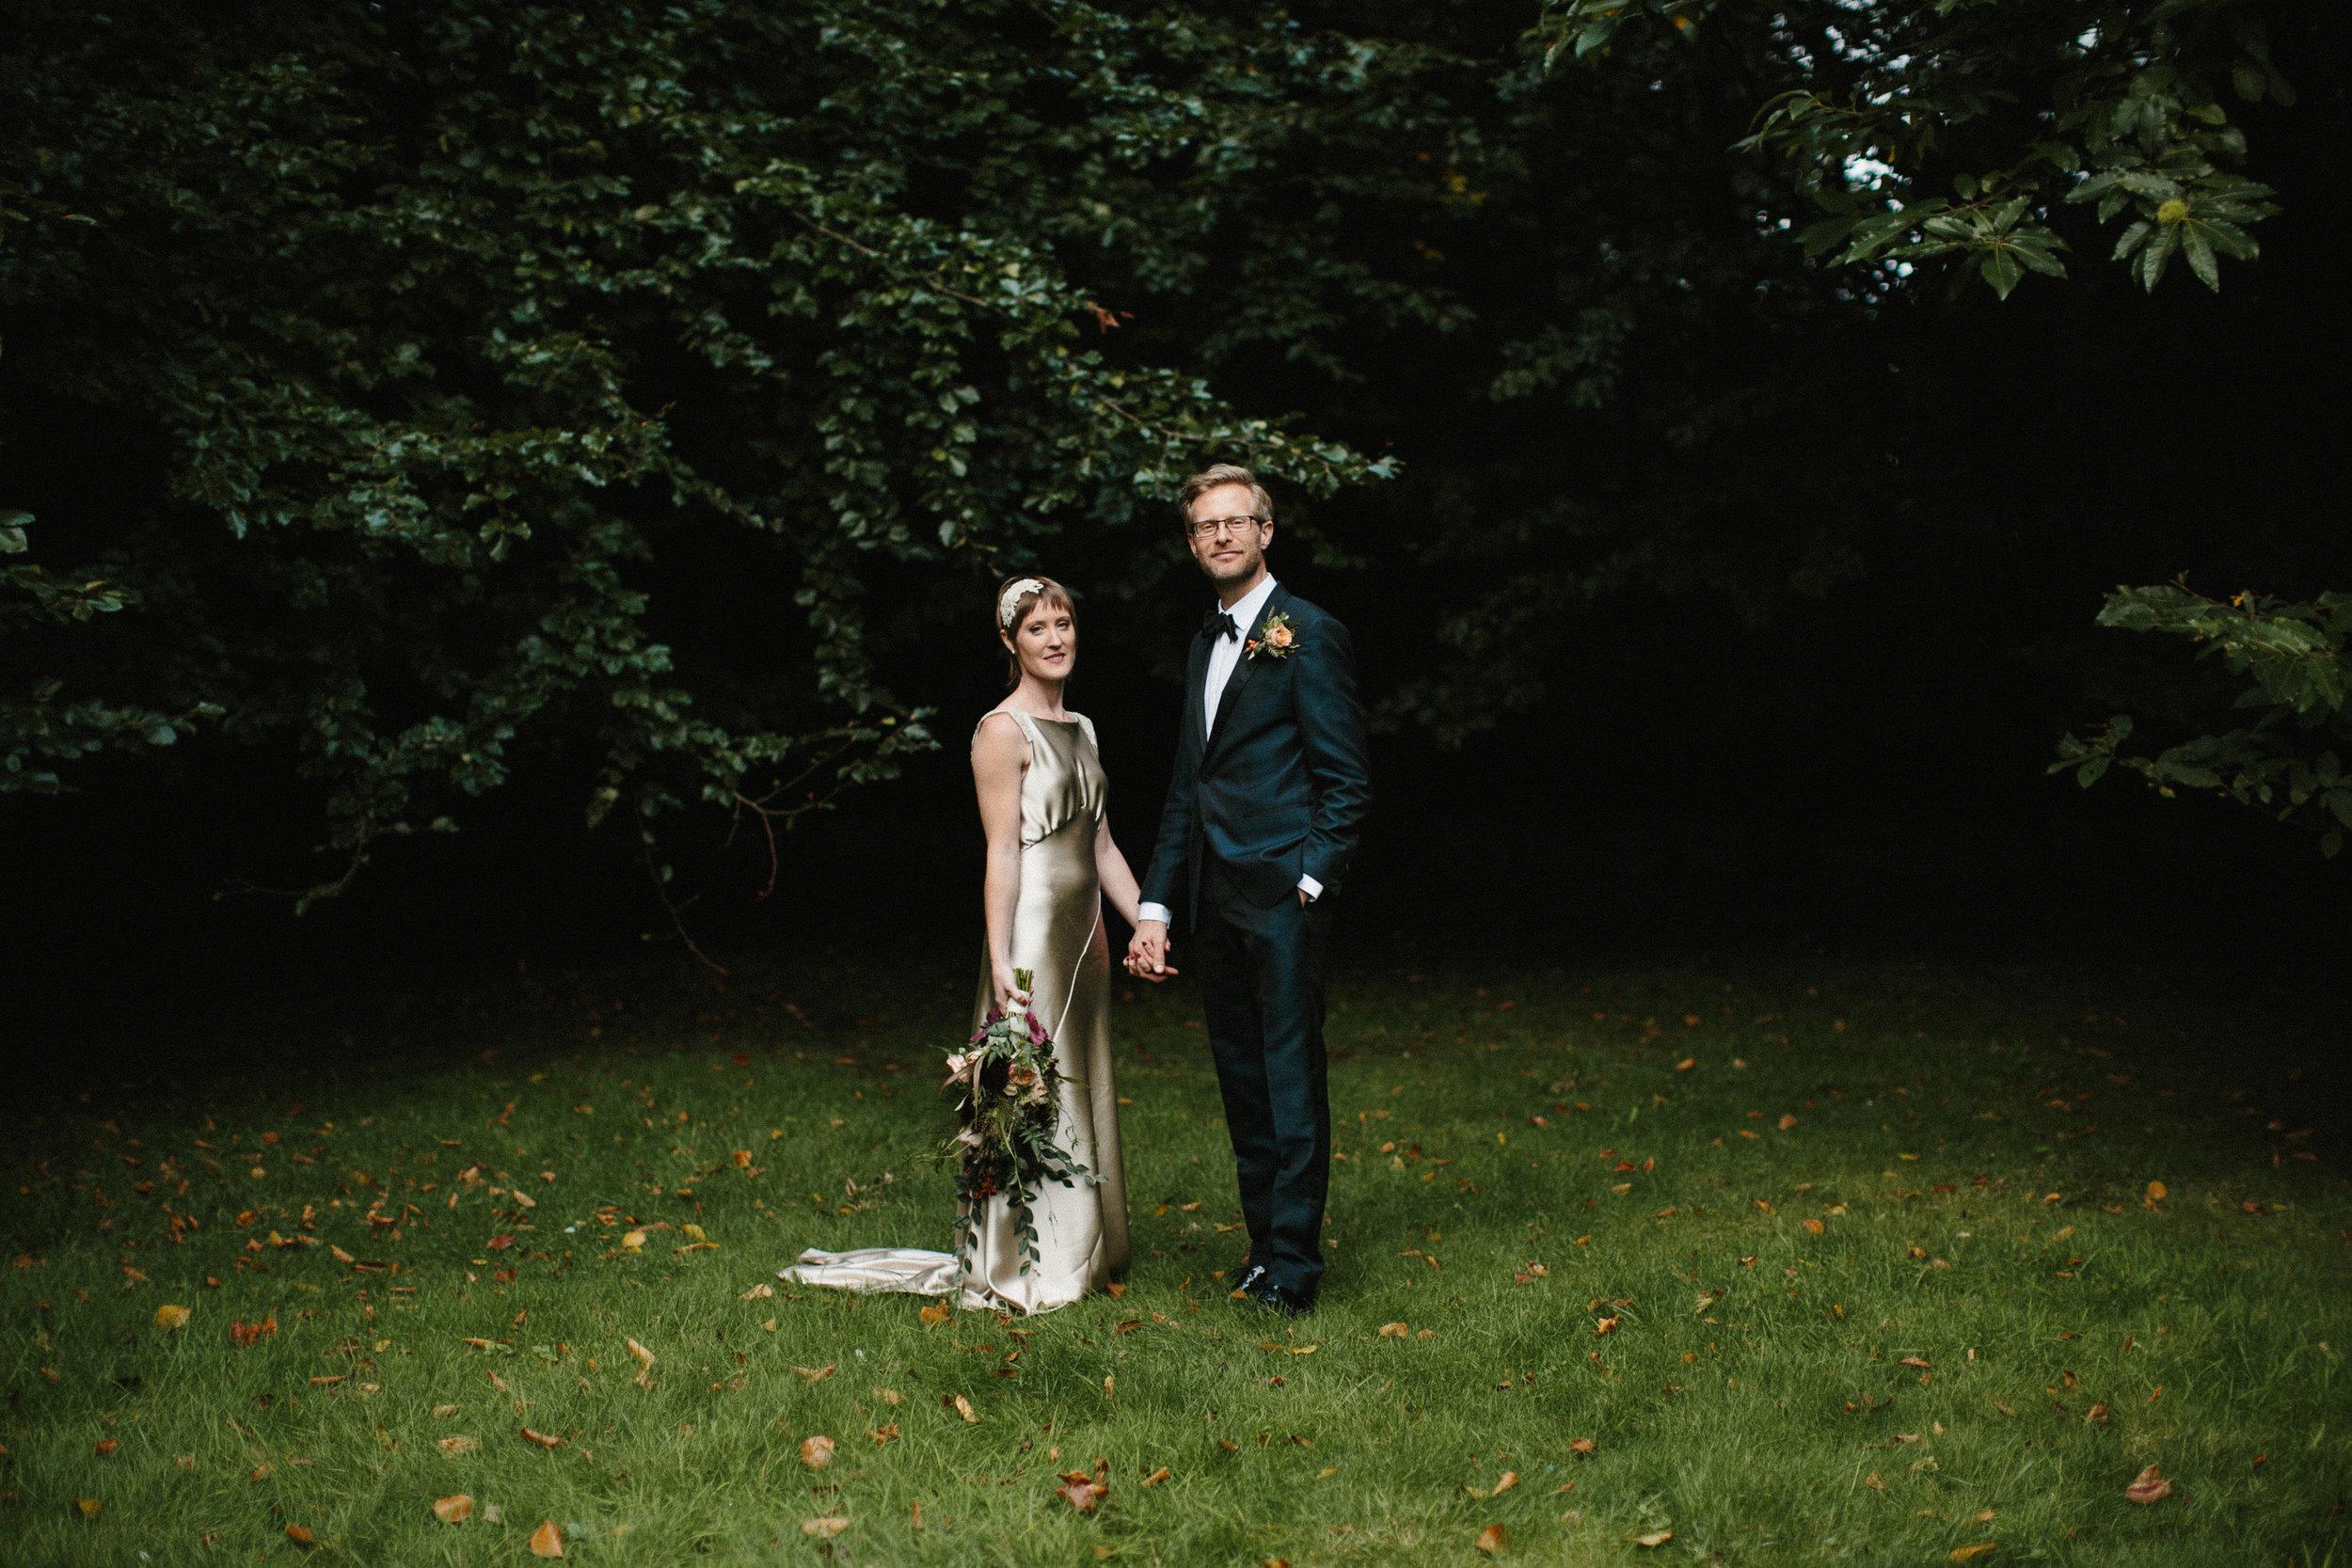 Kate-Beaumont-Sheffield-Honeysuckle-bias-cut-wedding-dress-oyster-Rosie33.jpg